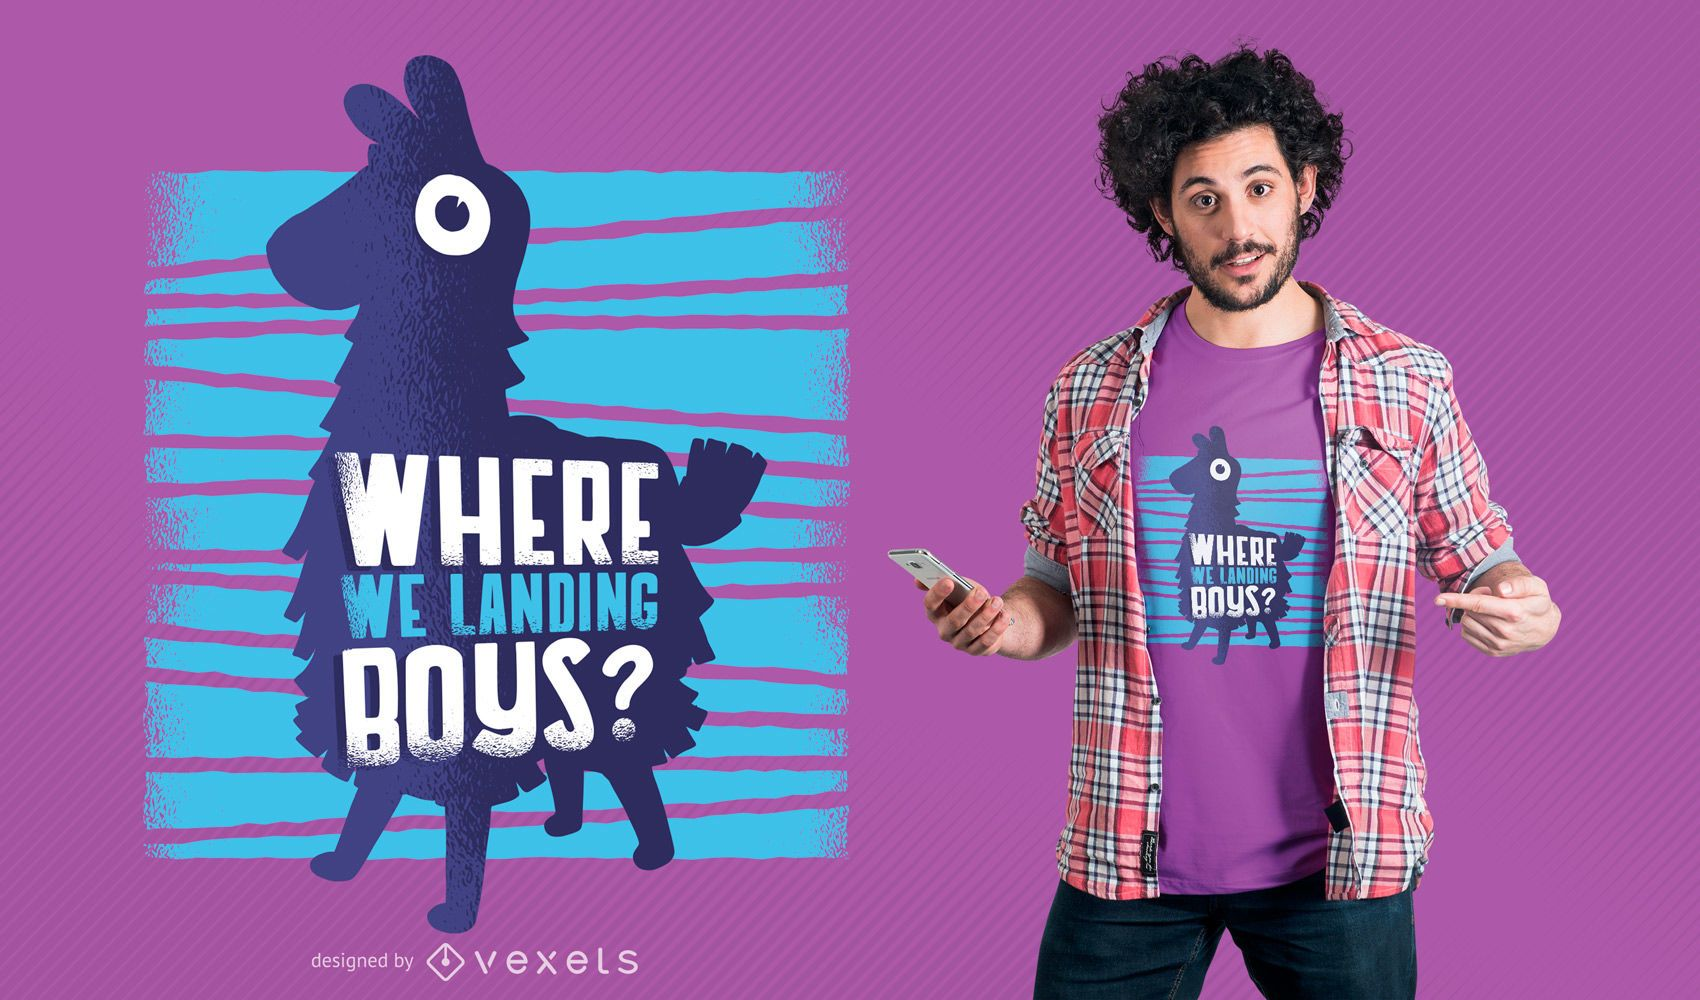 Funny Gaming Parody T-shirt Design